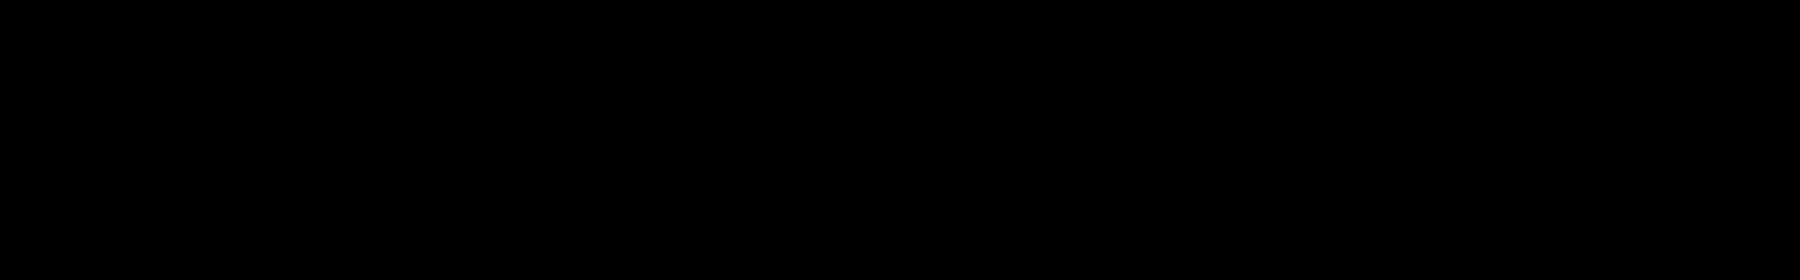 SMOOTH audio waveform